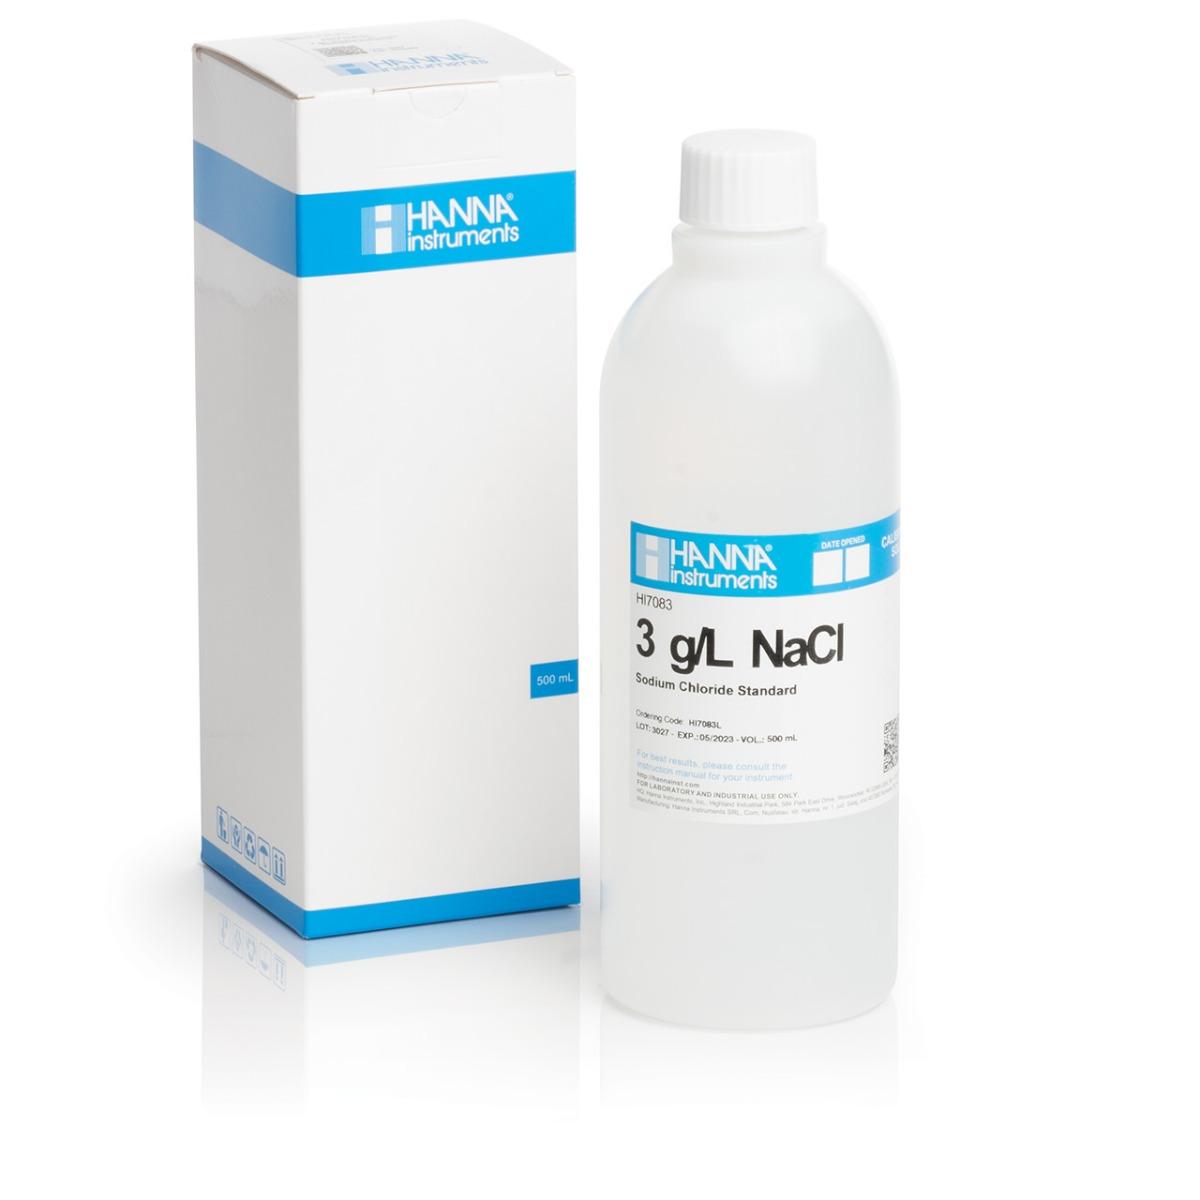 Solución Estándar de NaCl 3.0 g/L (500 ml) - HI7083L